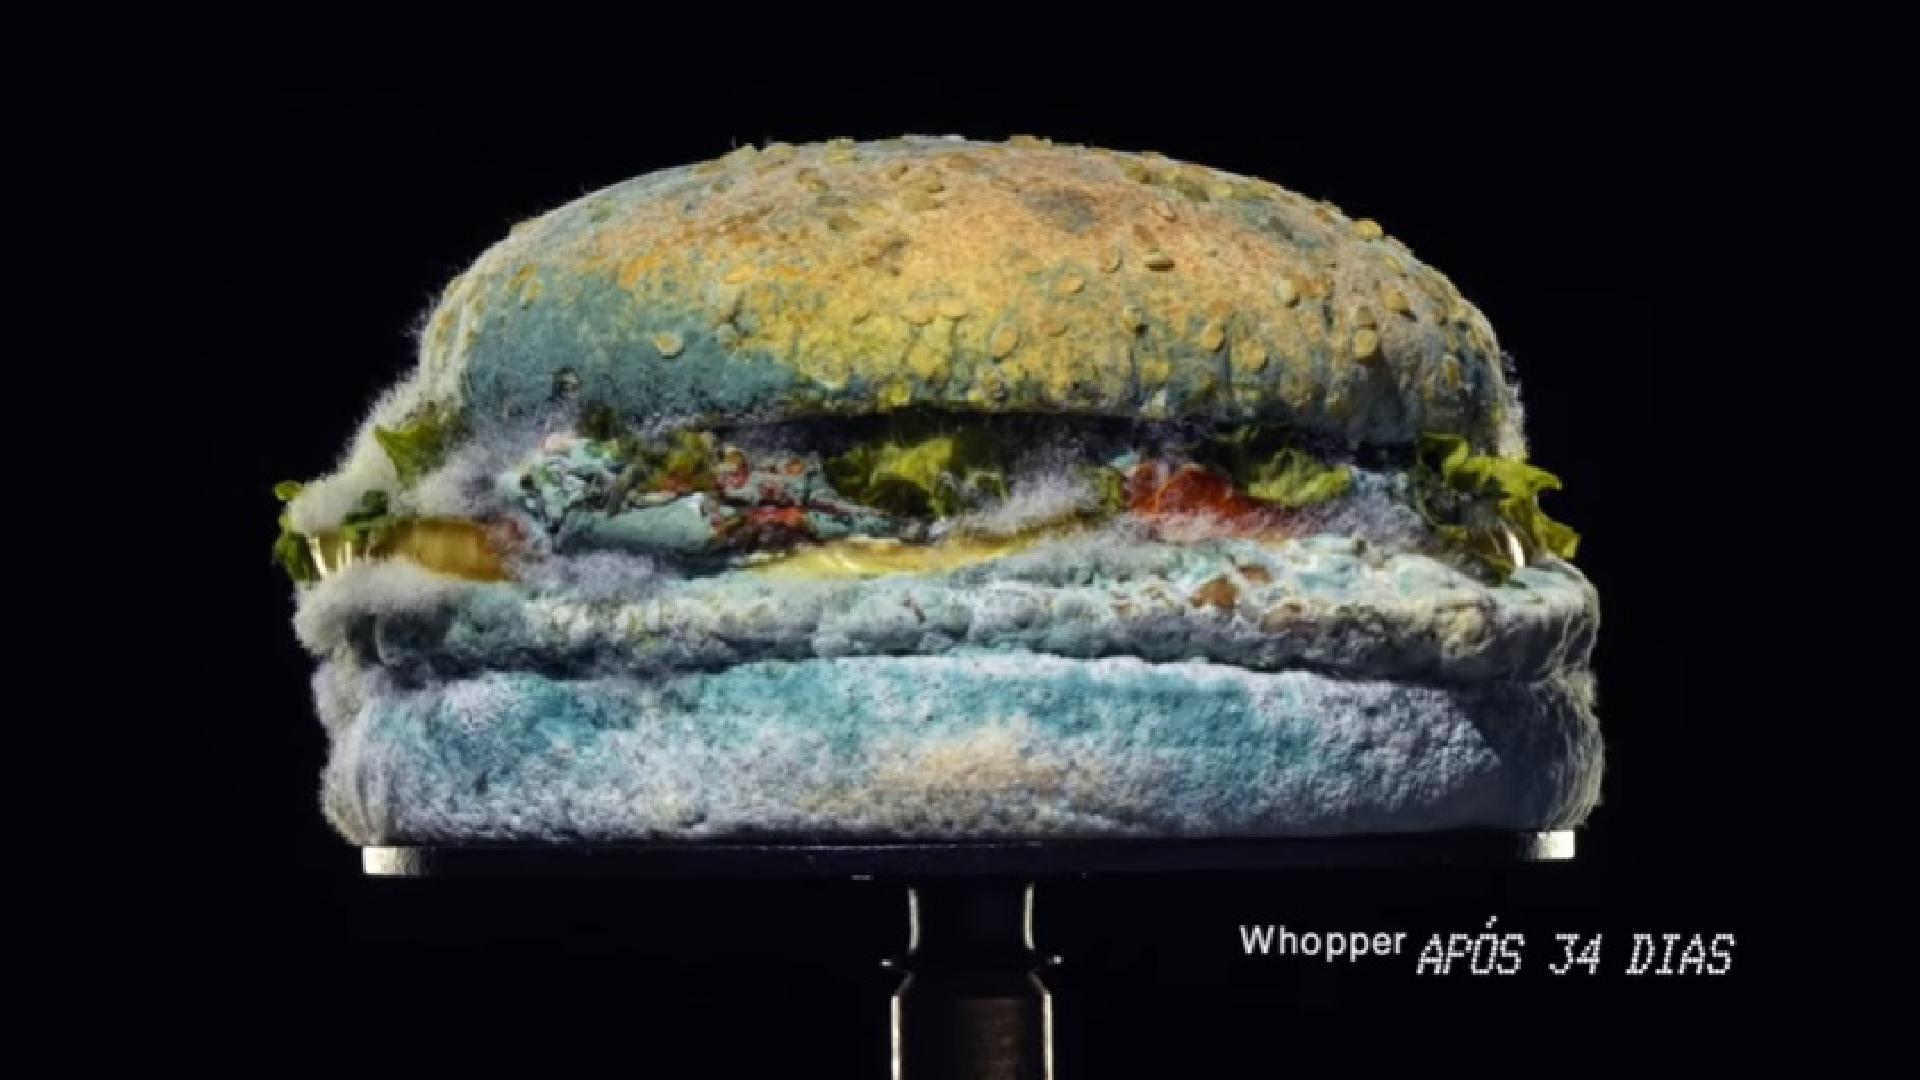 Burger King – Nada Além do Whopper